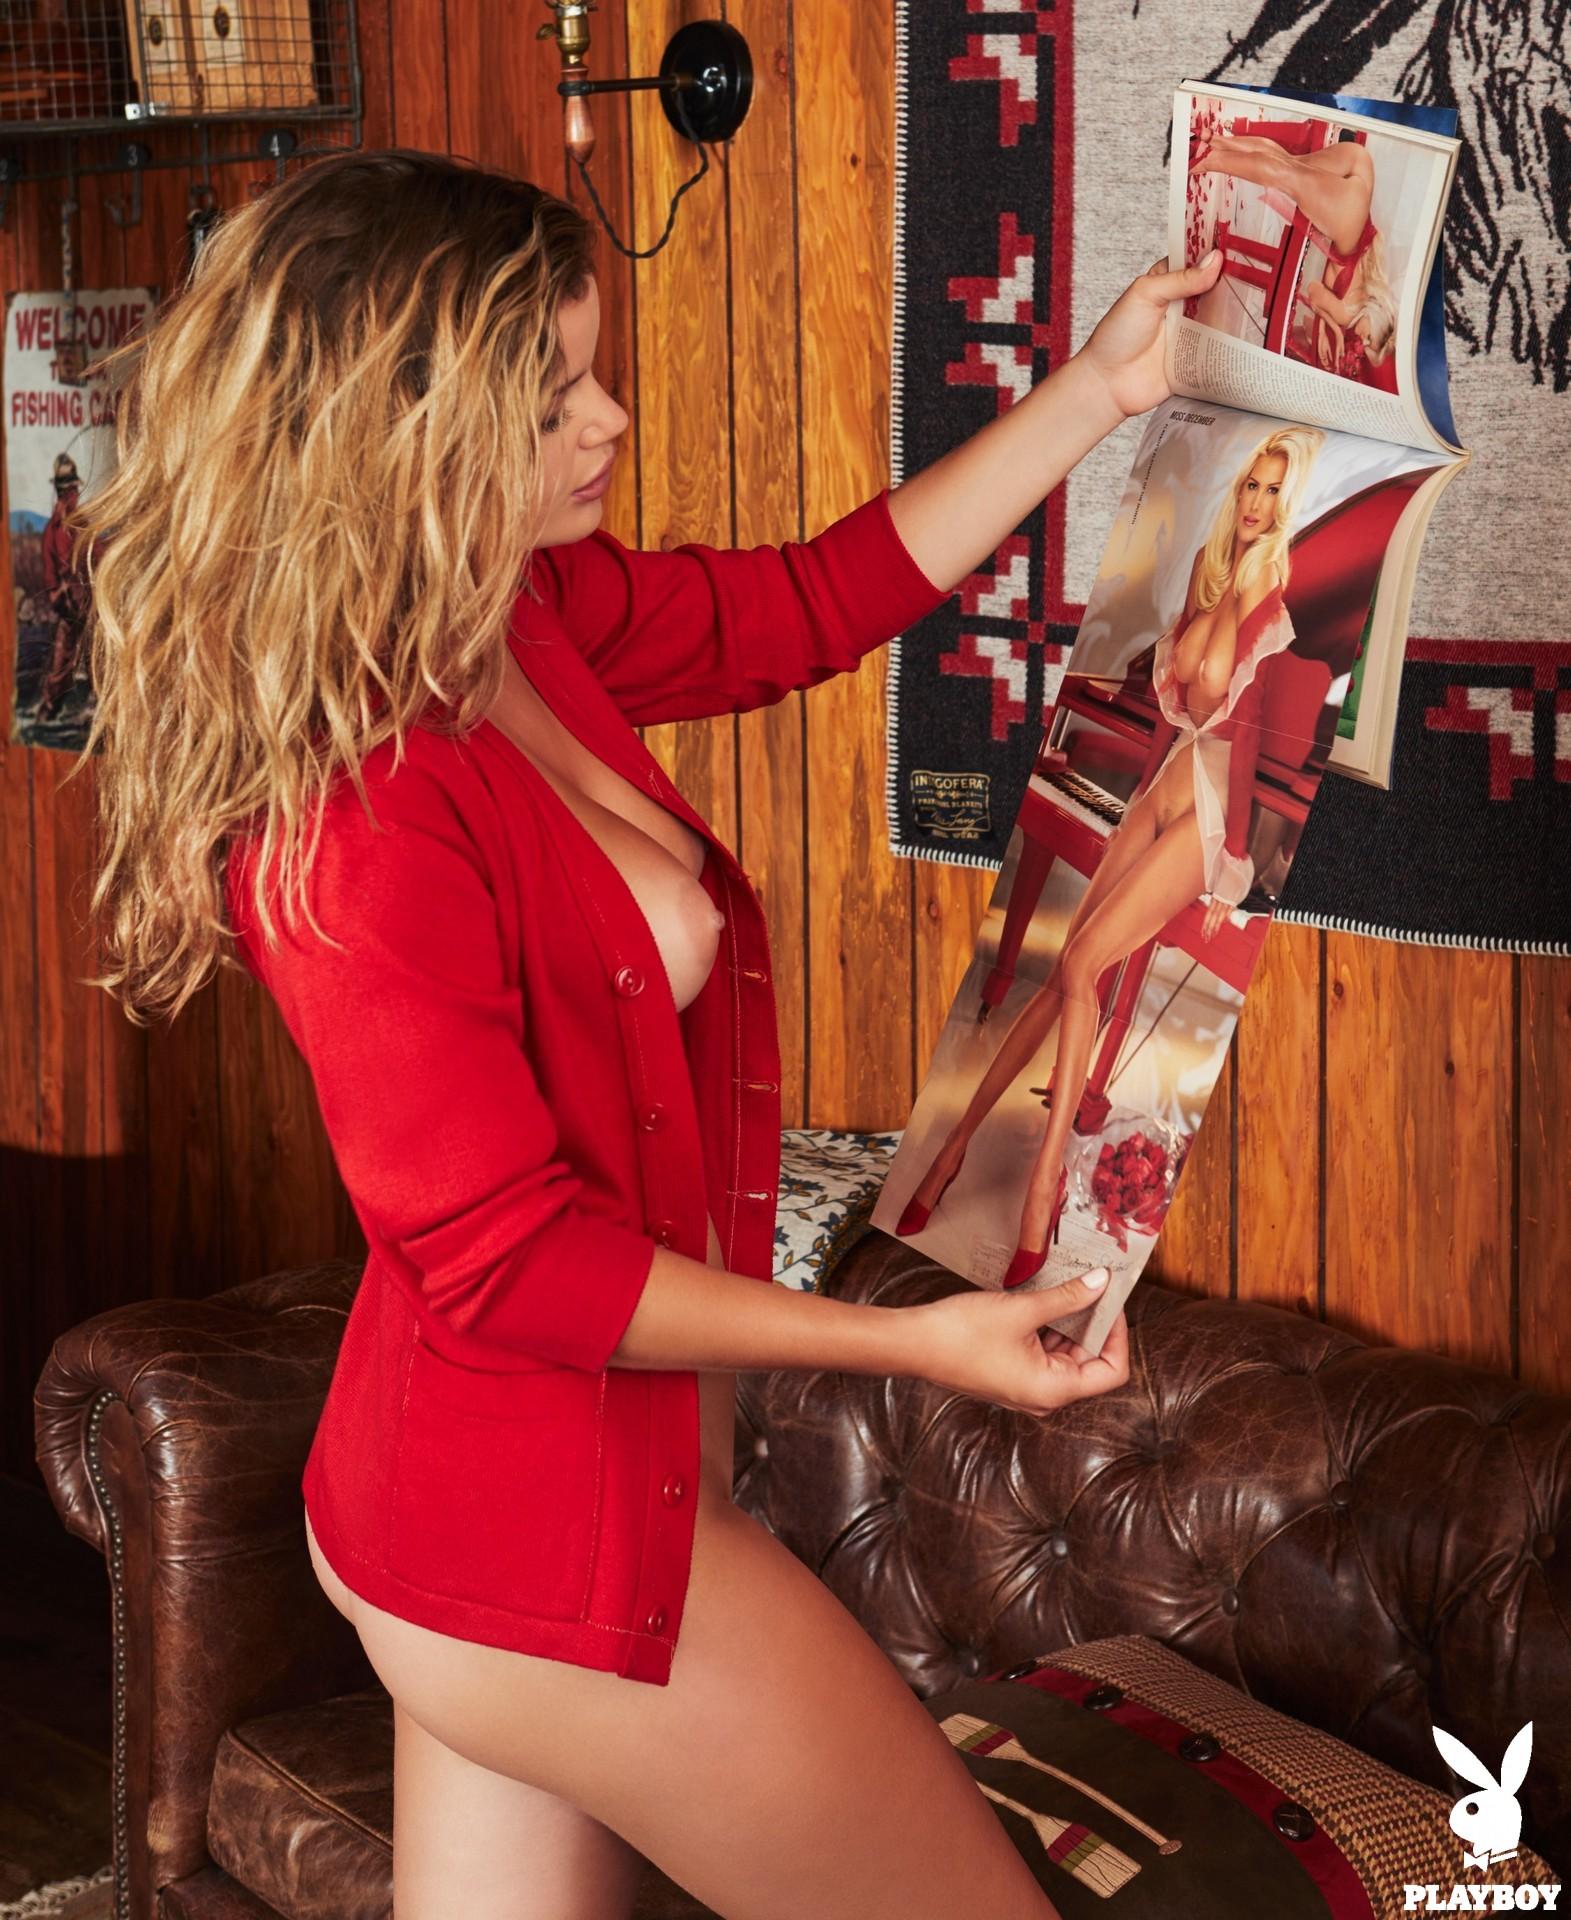 Playmate November 2018 Shelby Rose Playboy Plus (11)